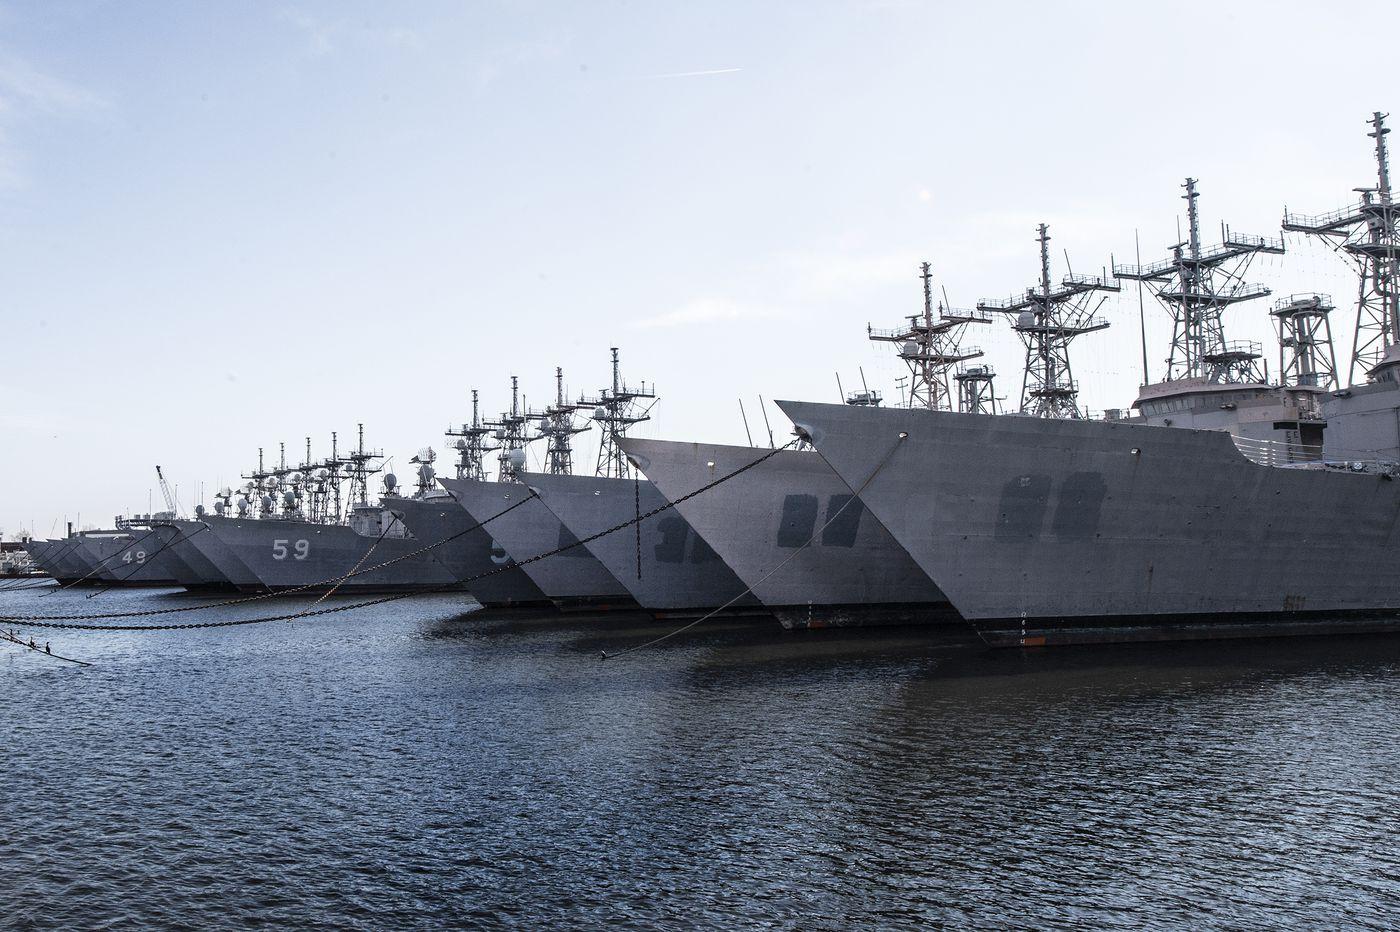 Philadelphia's 'mothball fleet': Uncertain future awaits ships docked at Navy Yard